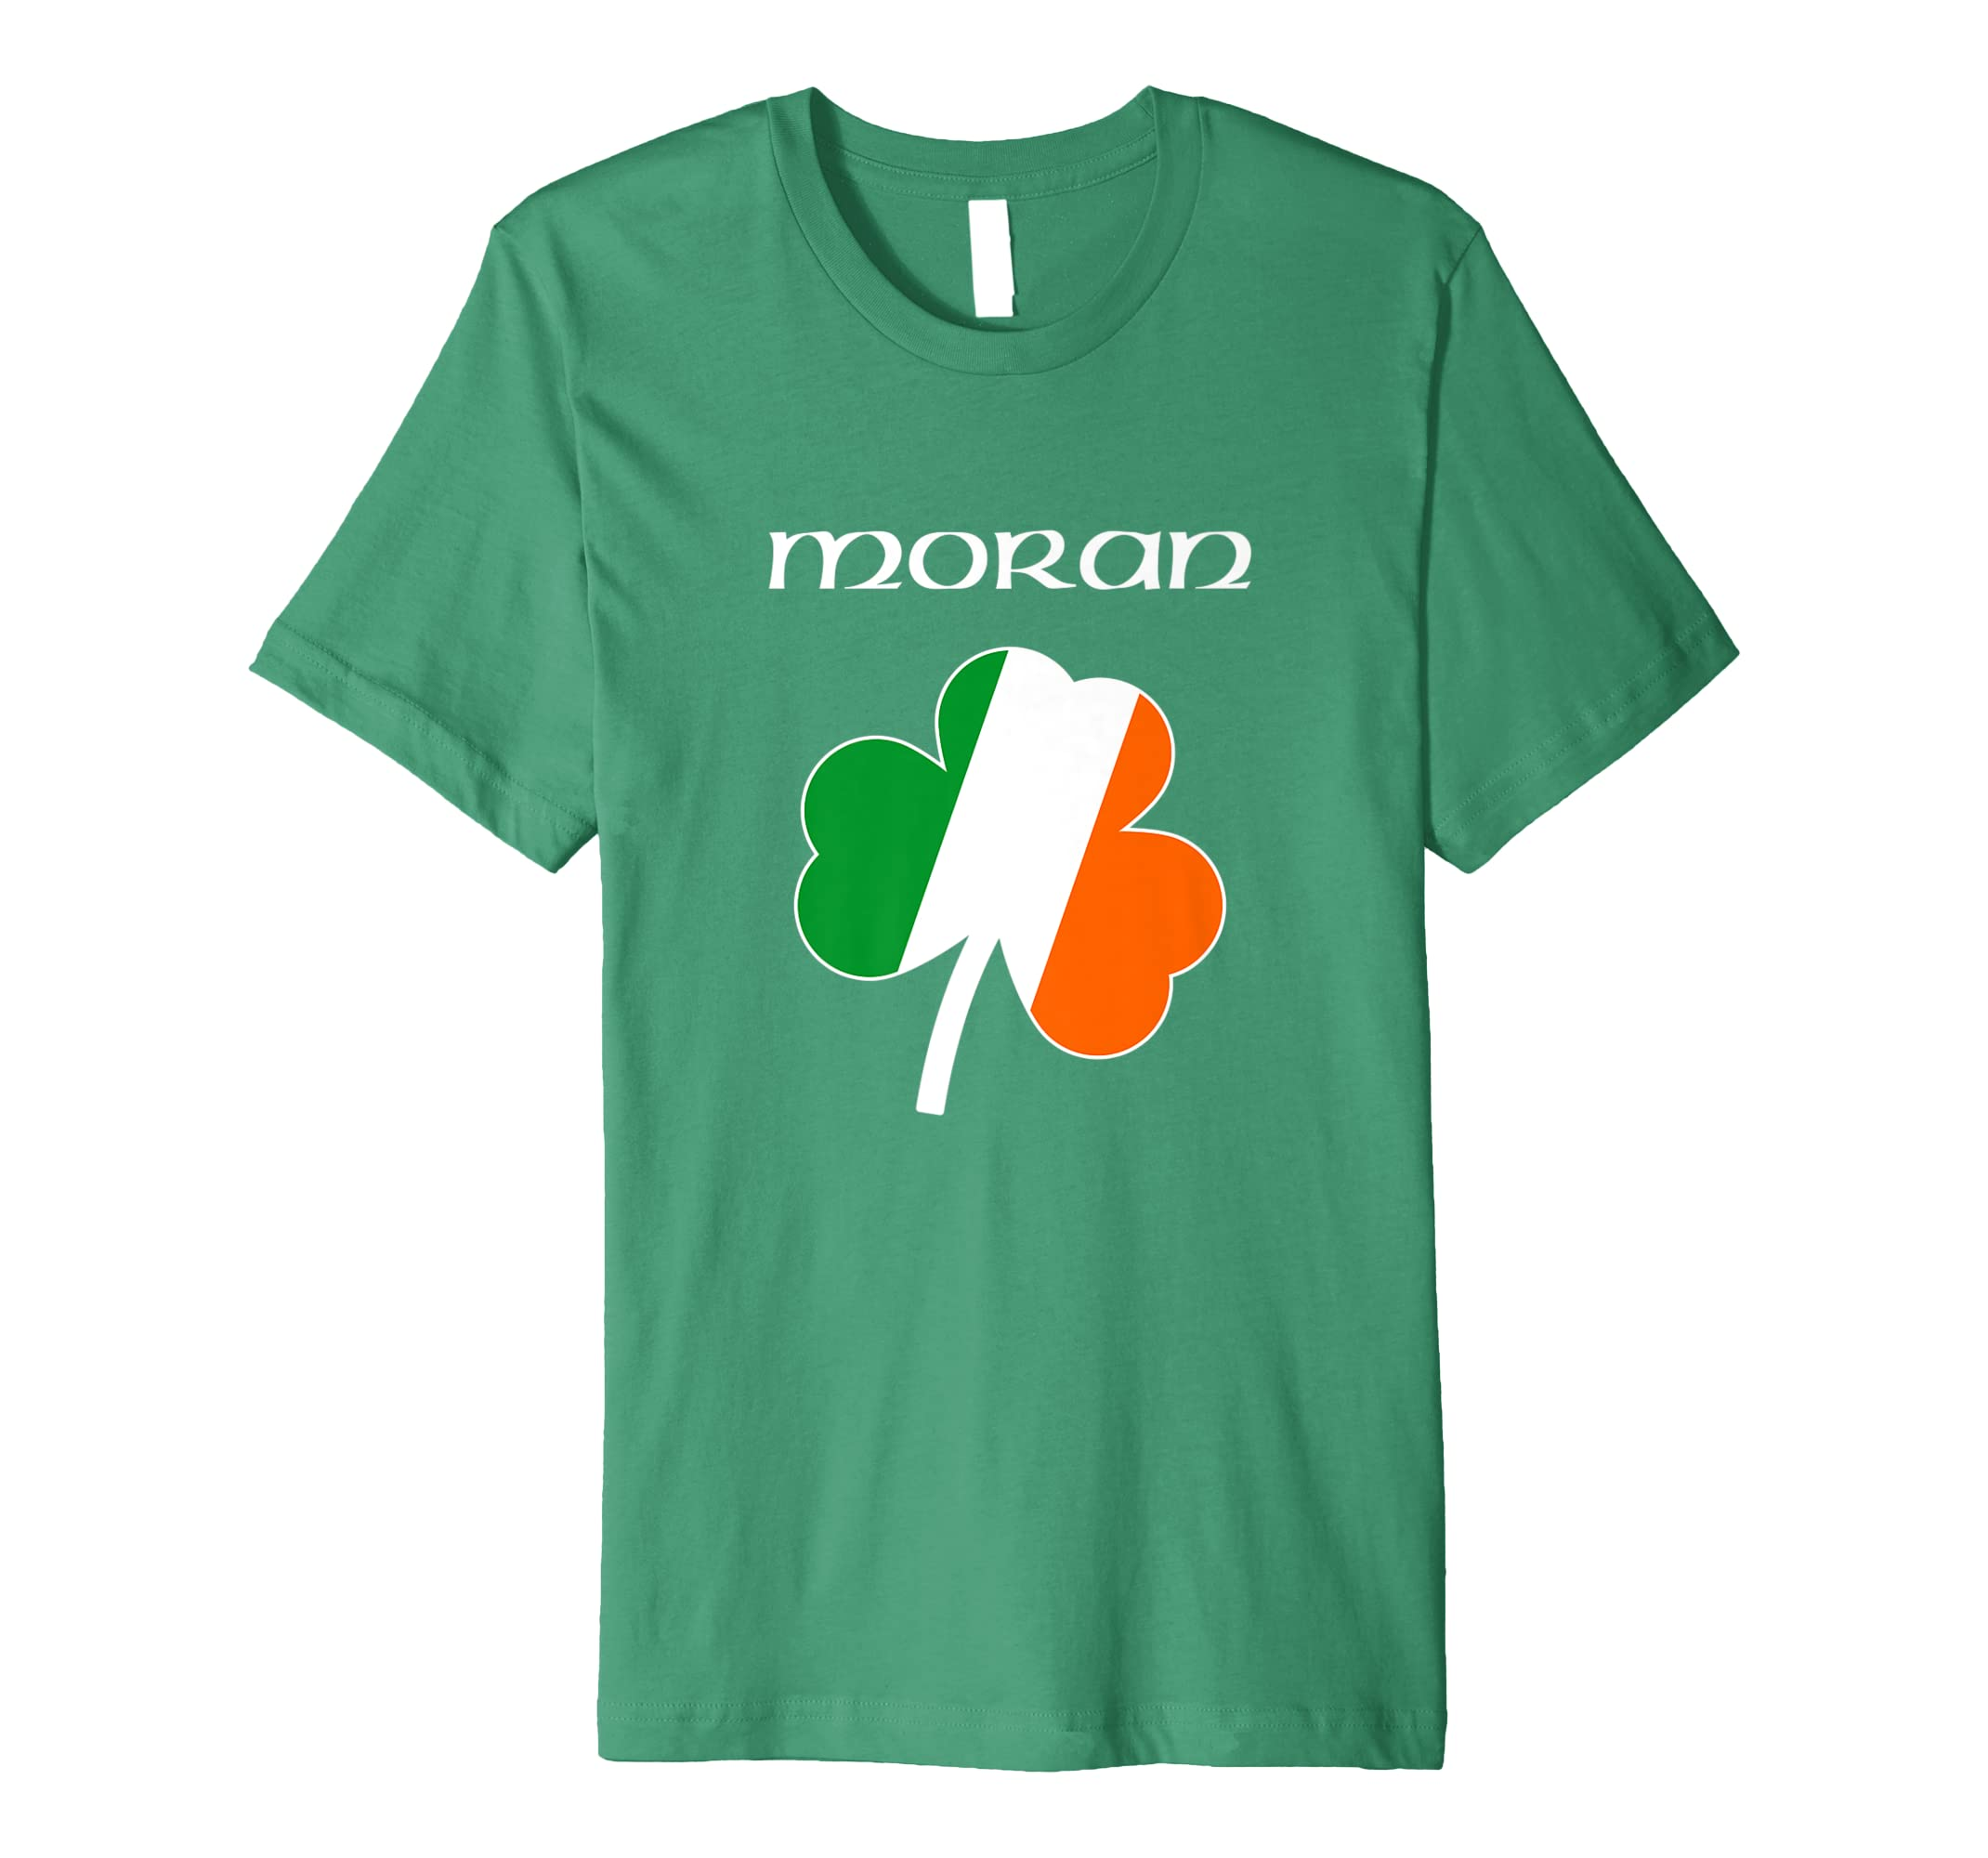 a0d0442eb18f0 Amazon.com: Moran T Shirt Irish Name Shamrock: Clothing